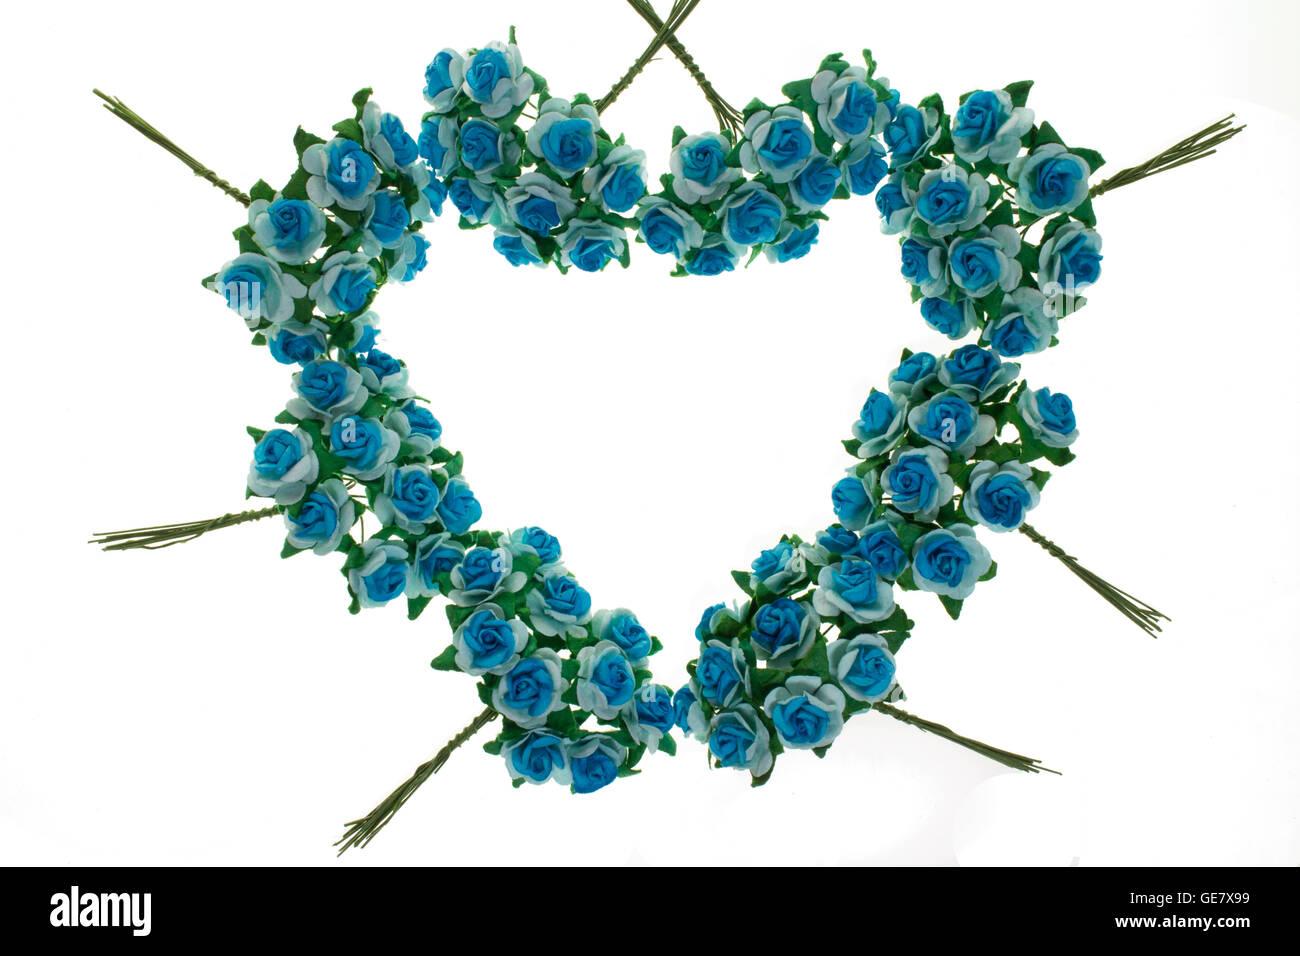 Primavera De Ramas Floridas Flores Azules Sin Hojas Flores